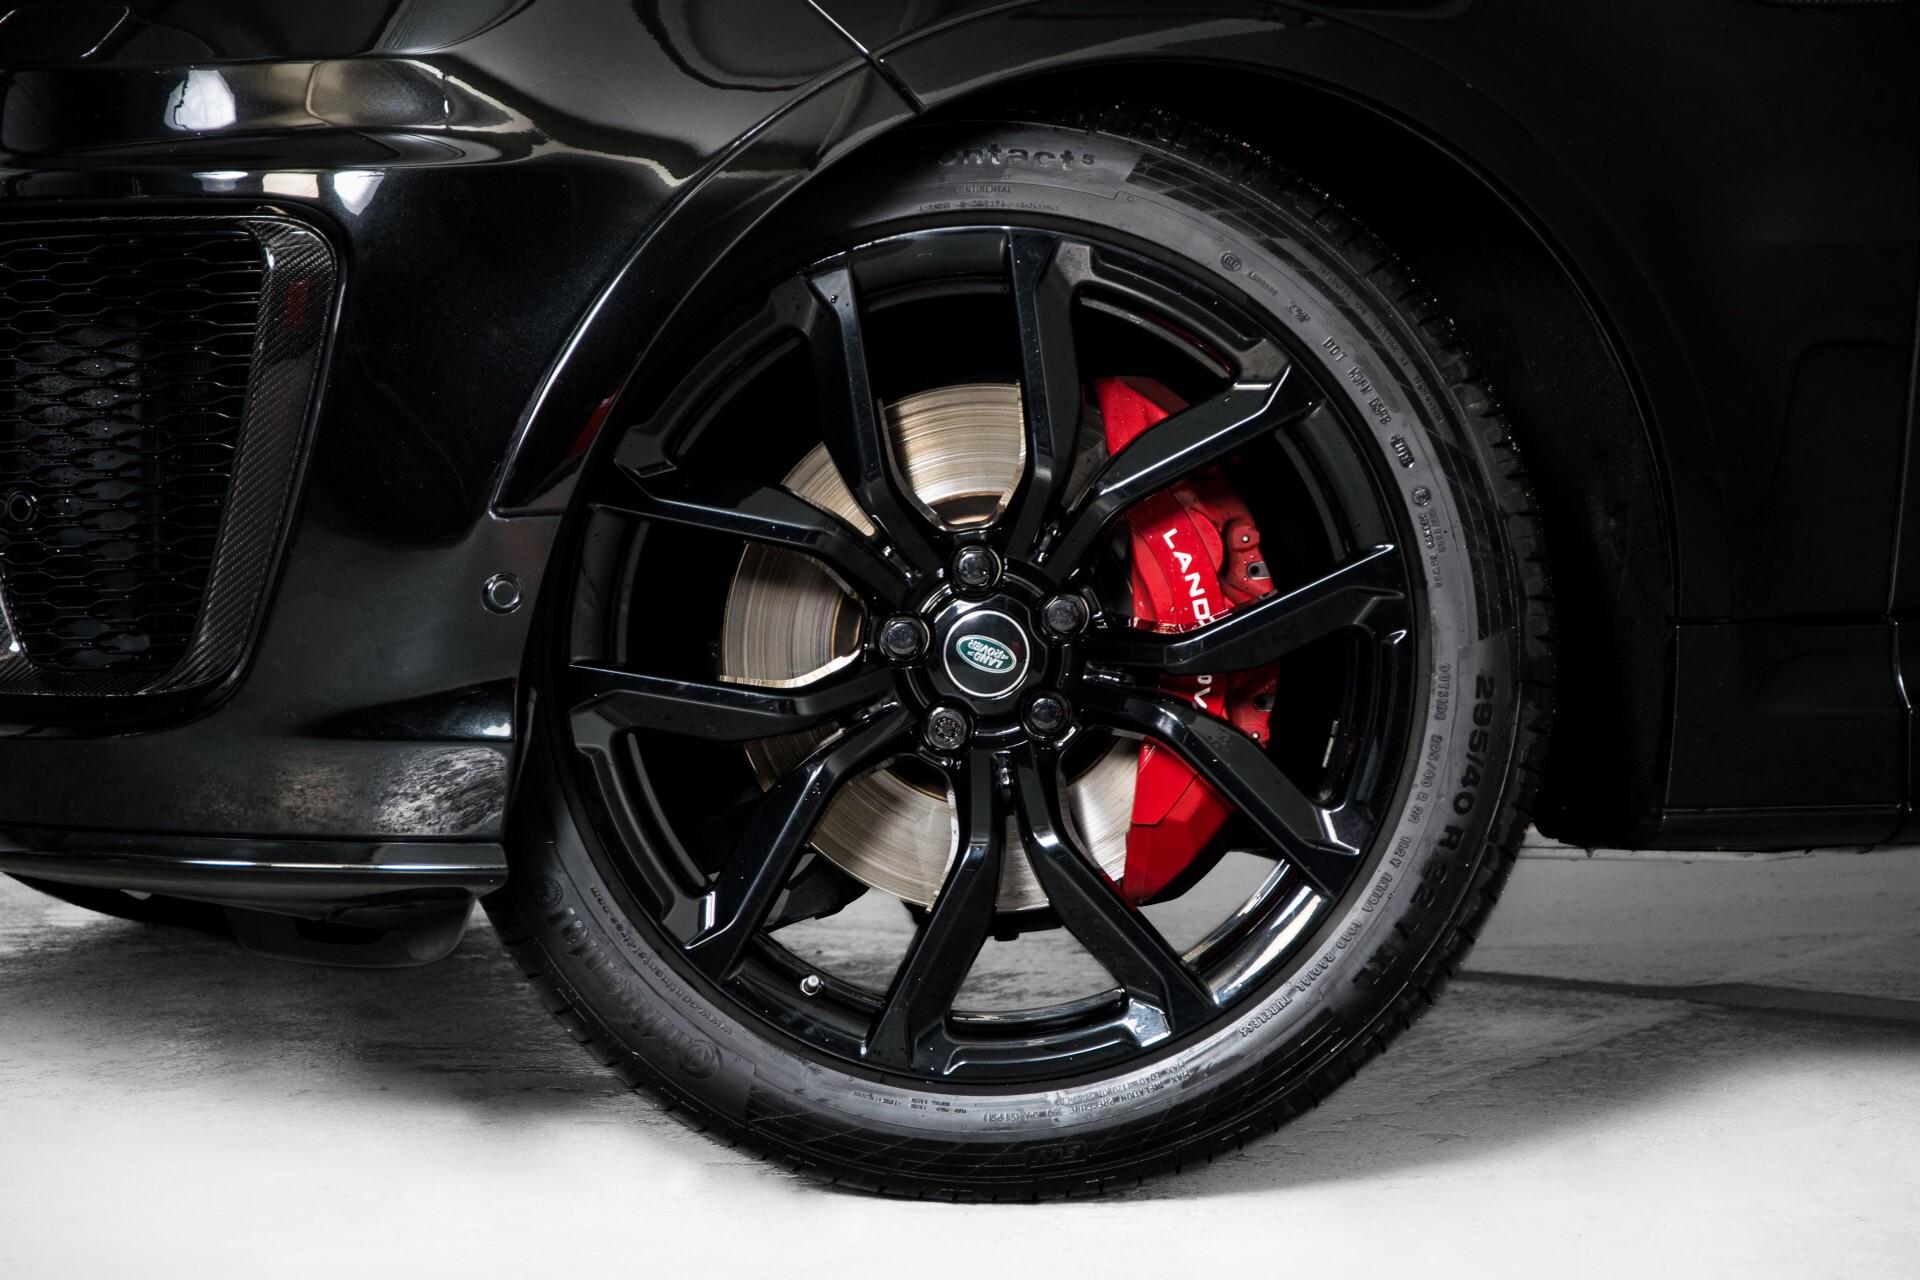 Land Rover Range Rover Sport SVR 5.0 Supercharged 575pk Full Carbon Nieuwprijs €241377 Foto 58